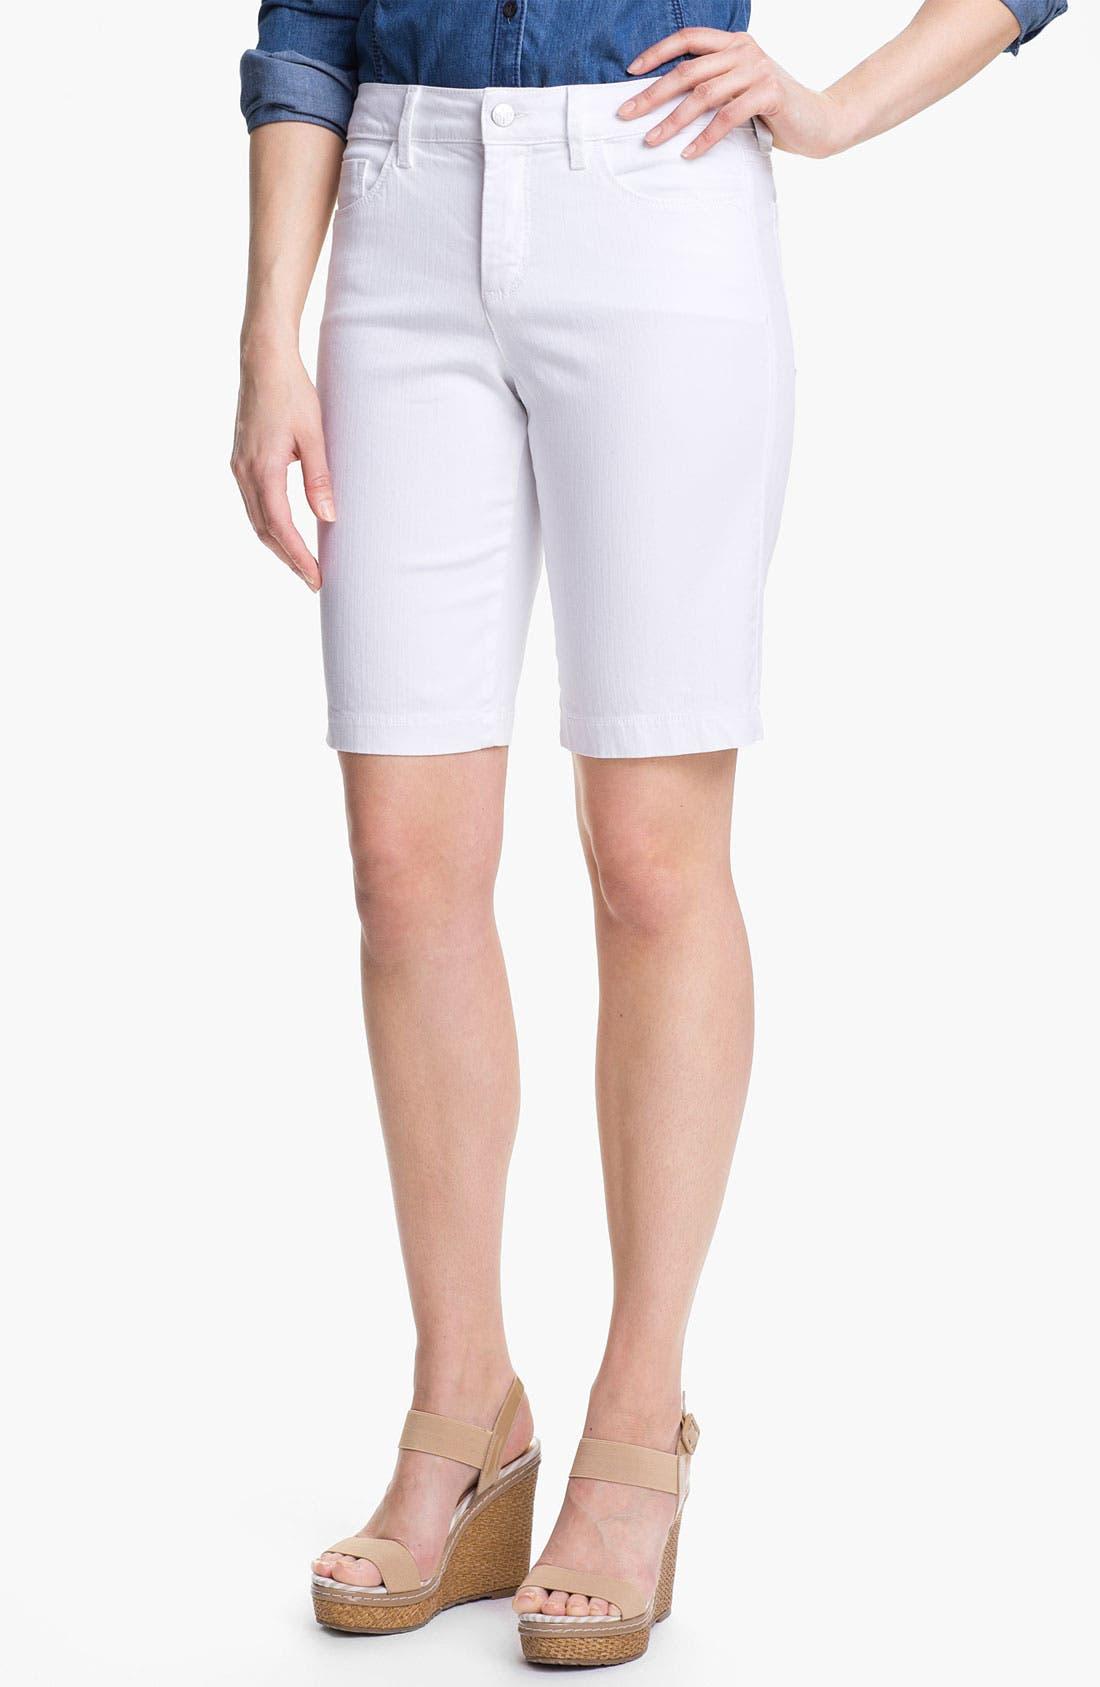 Alternate Image 1 Selected - NYDJ 'Helen' Stretch Denim Shorts